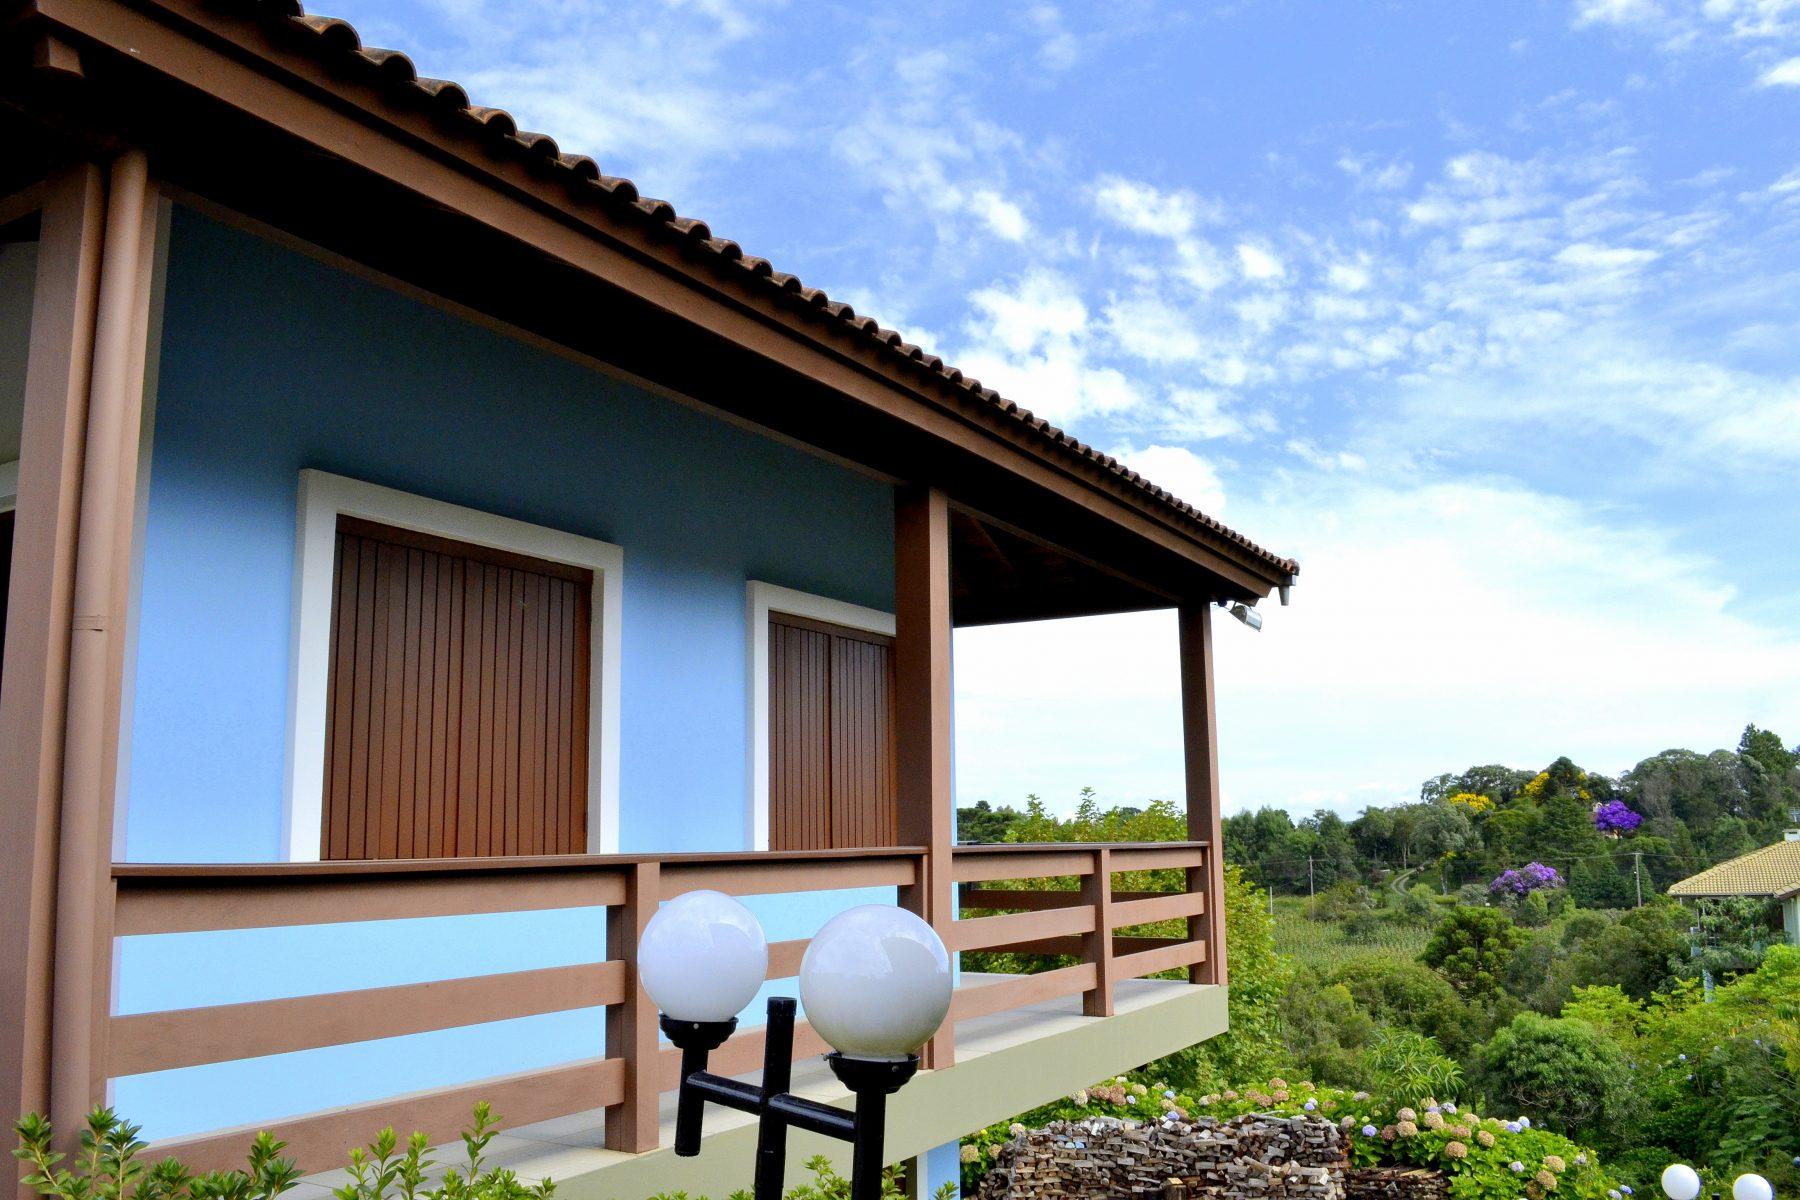 Bangalo Hortensia Novo 2018 – Exteriores (1)